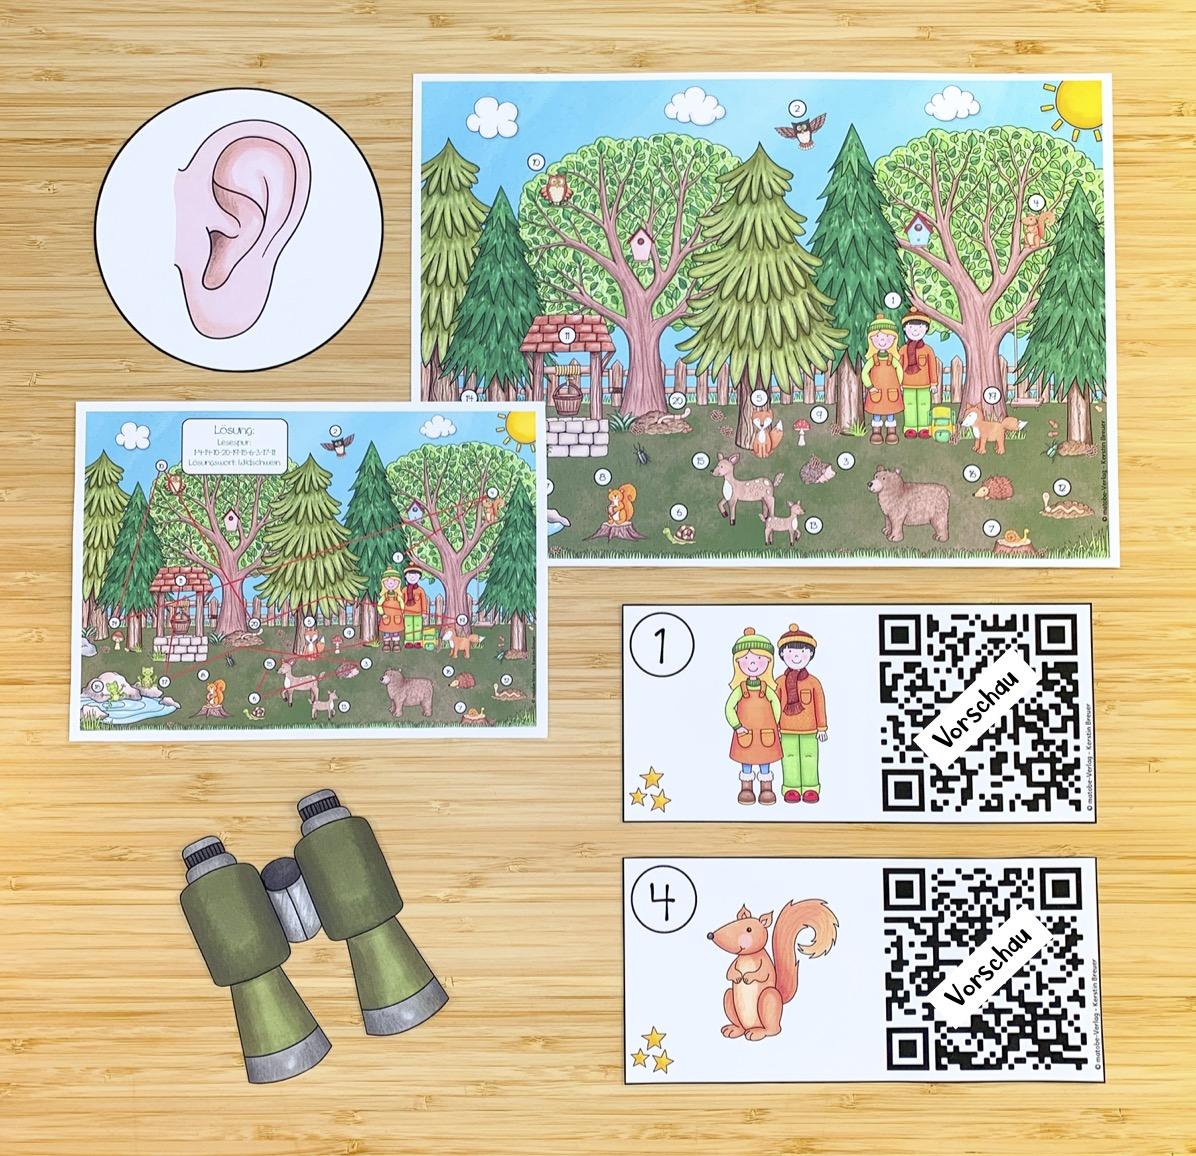 Interaktive Hörspur: Wald